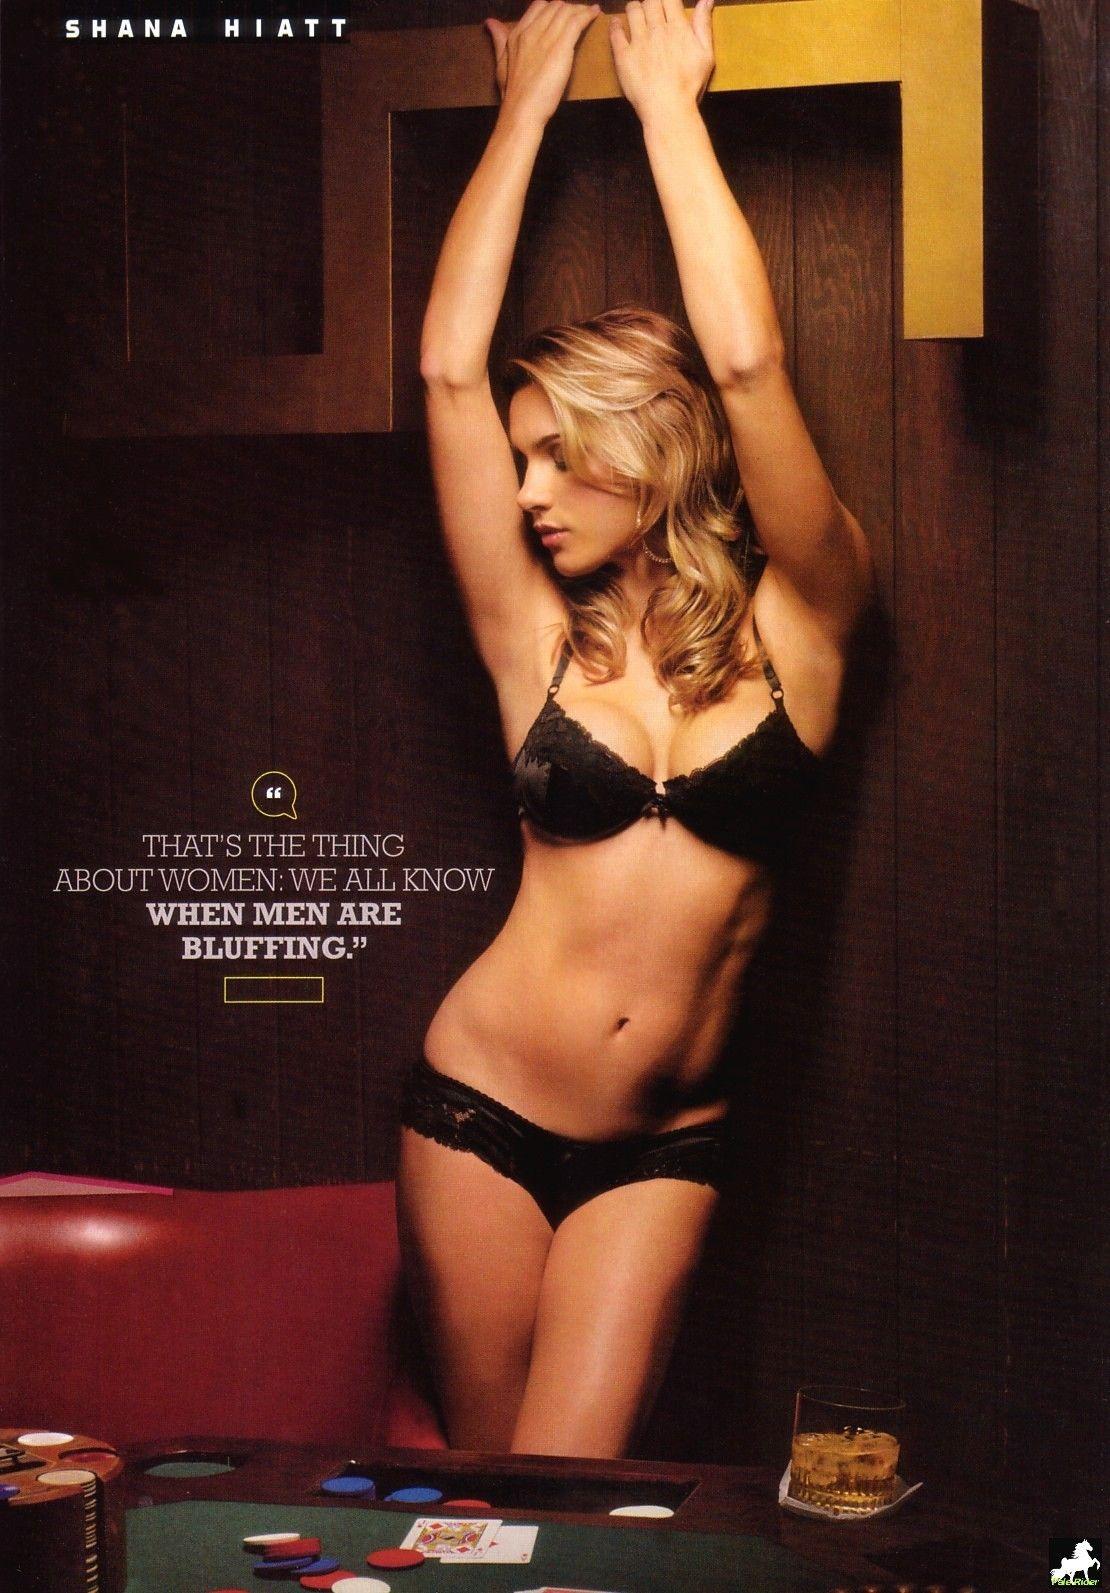 Shana Hiatt | Hottest models, Model, Bikinis